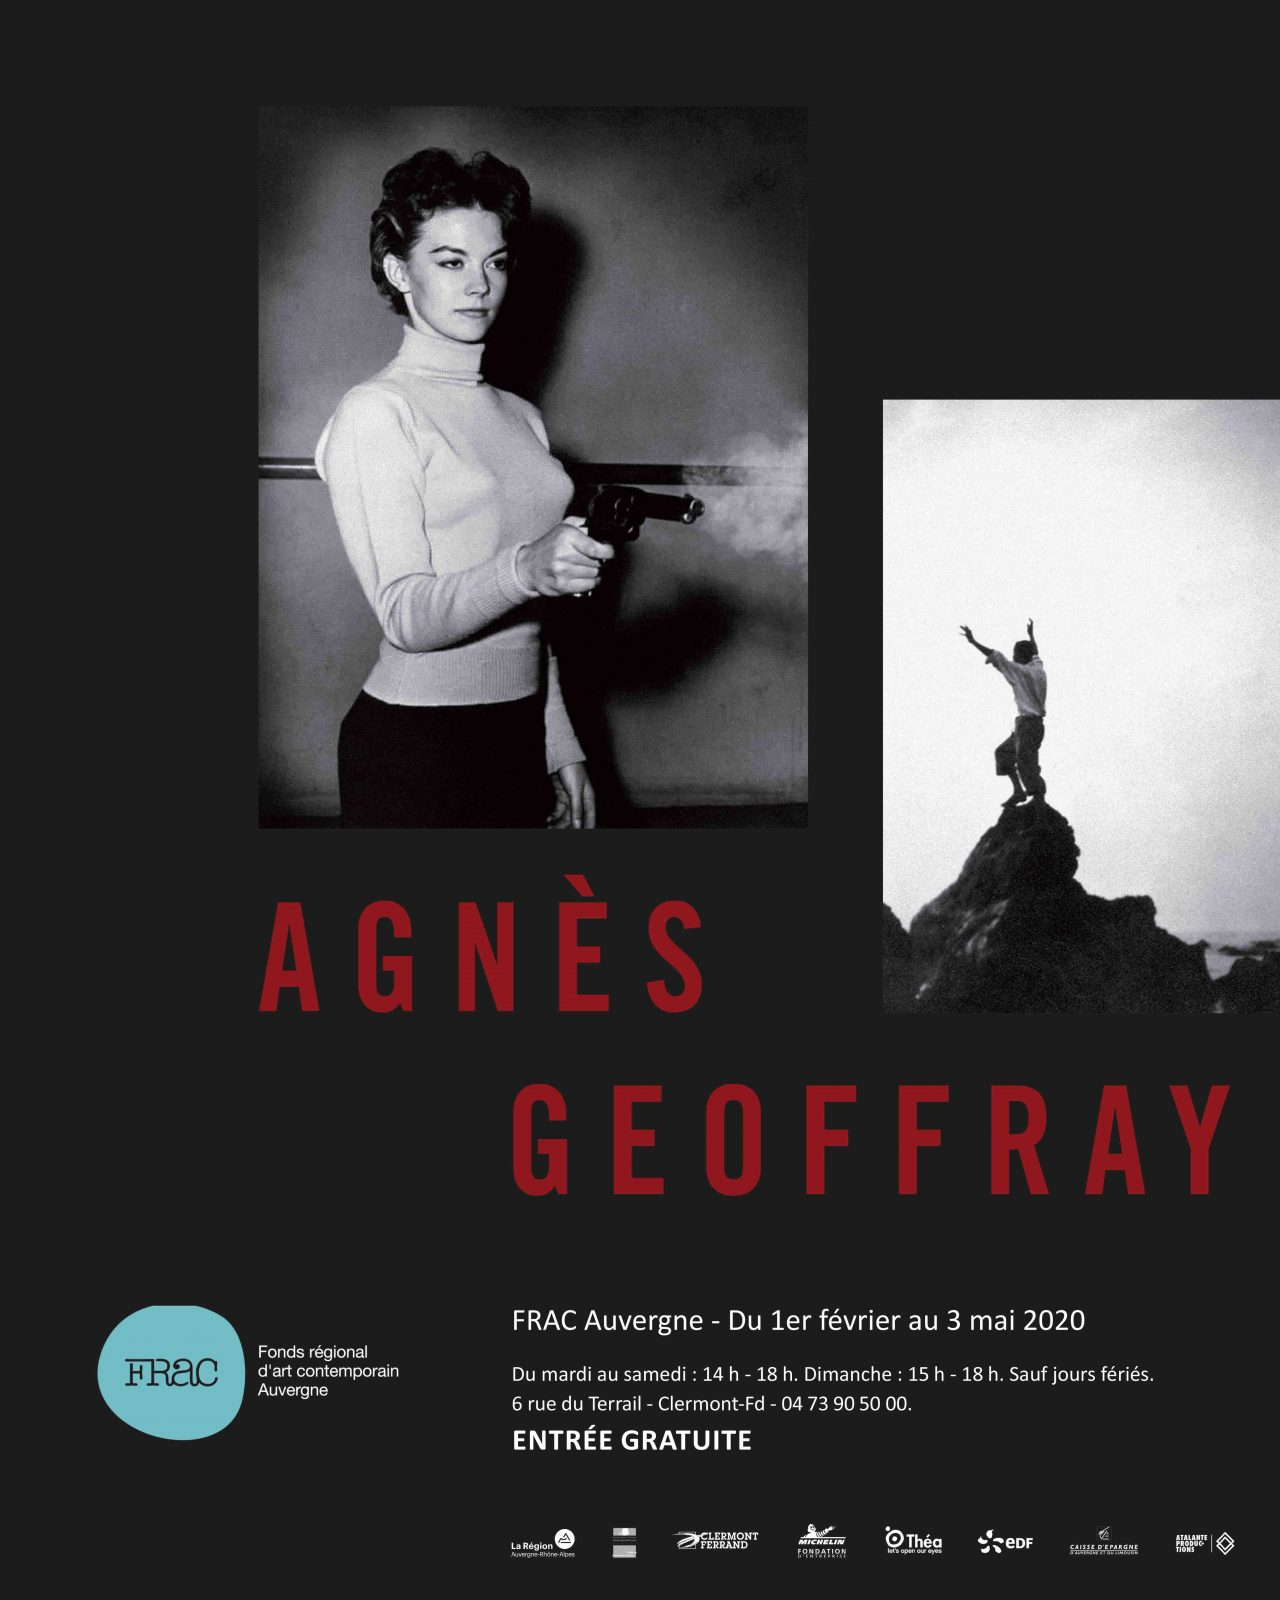 Agnès Geoffrey